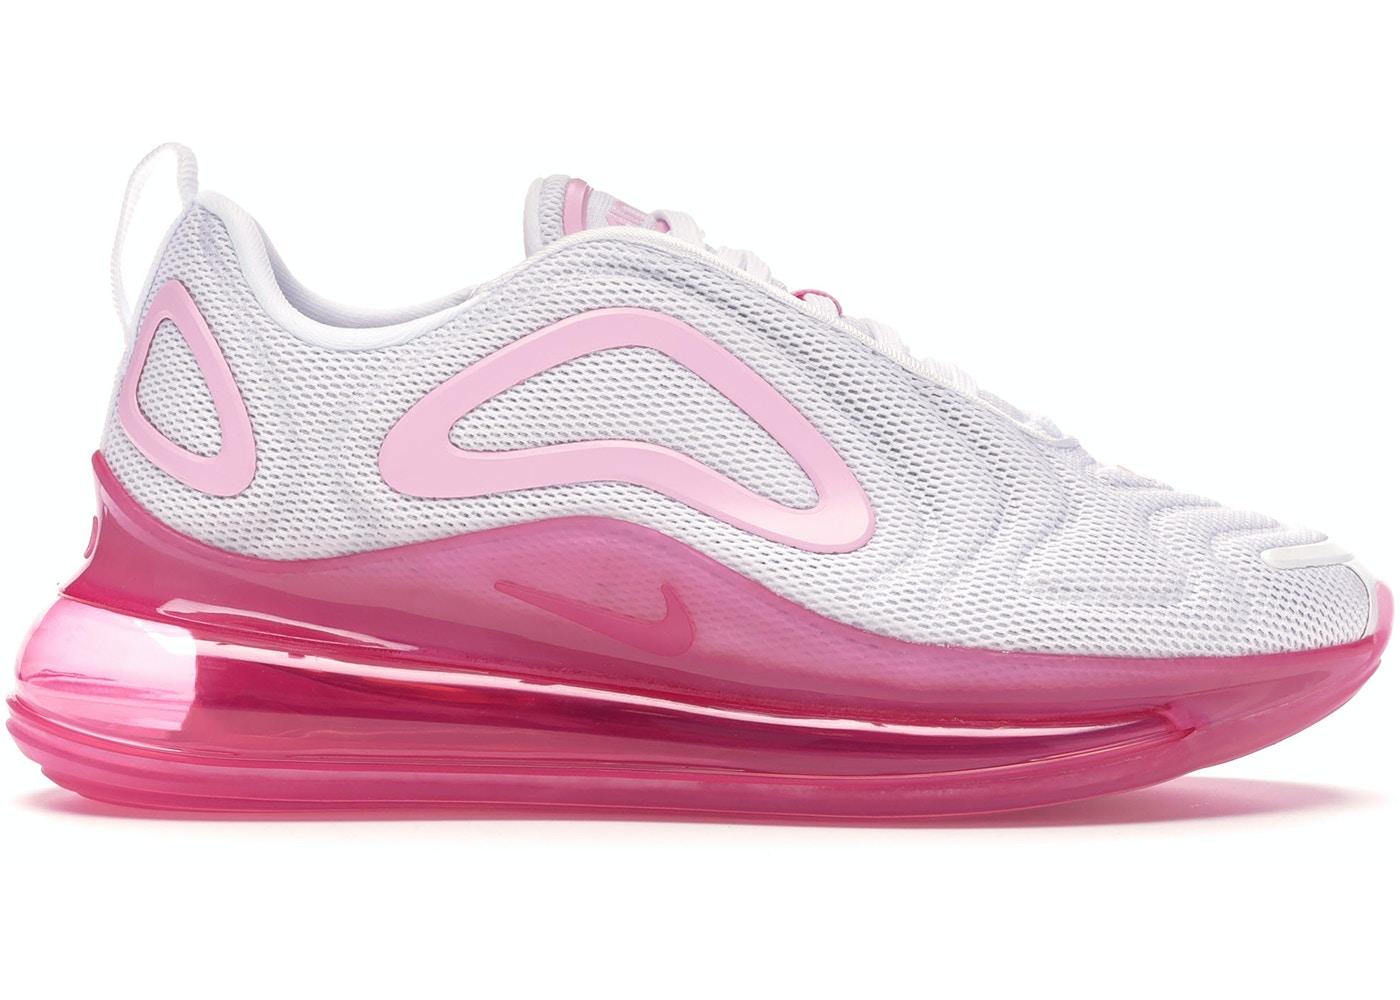 auricular ozono defensa  Nike Air Max 720 White Pink Rise Laser Fuchsia (W) - AR9293-103